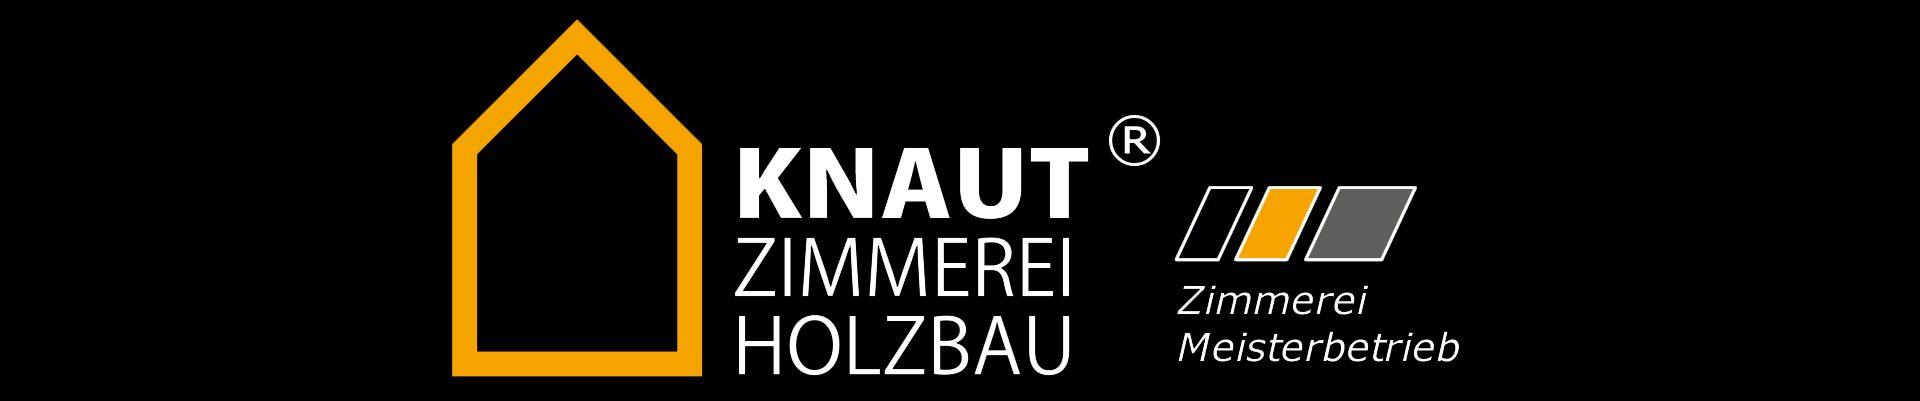 Knaut Zimmerei Holzbau – im Raum Kempten / Allgäu